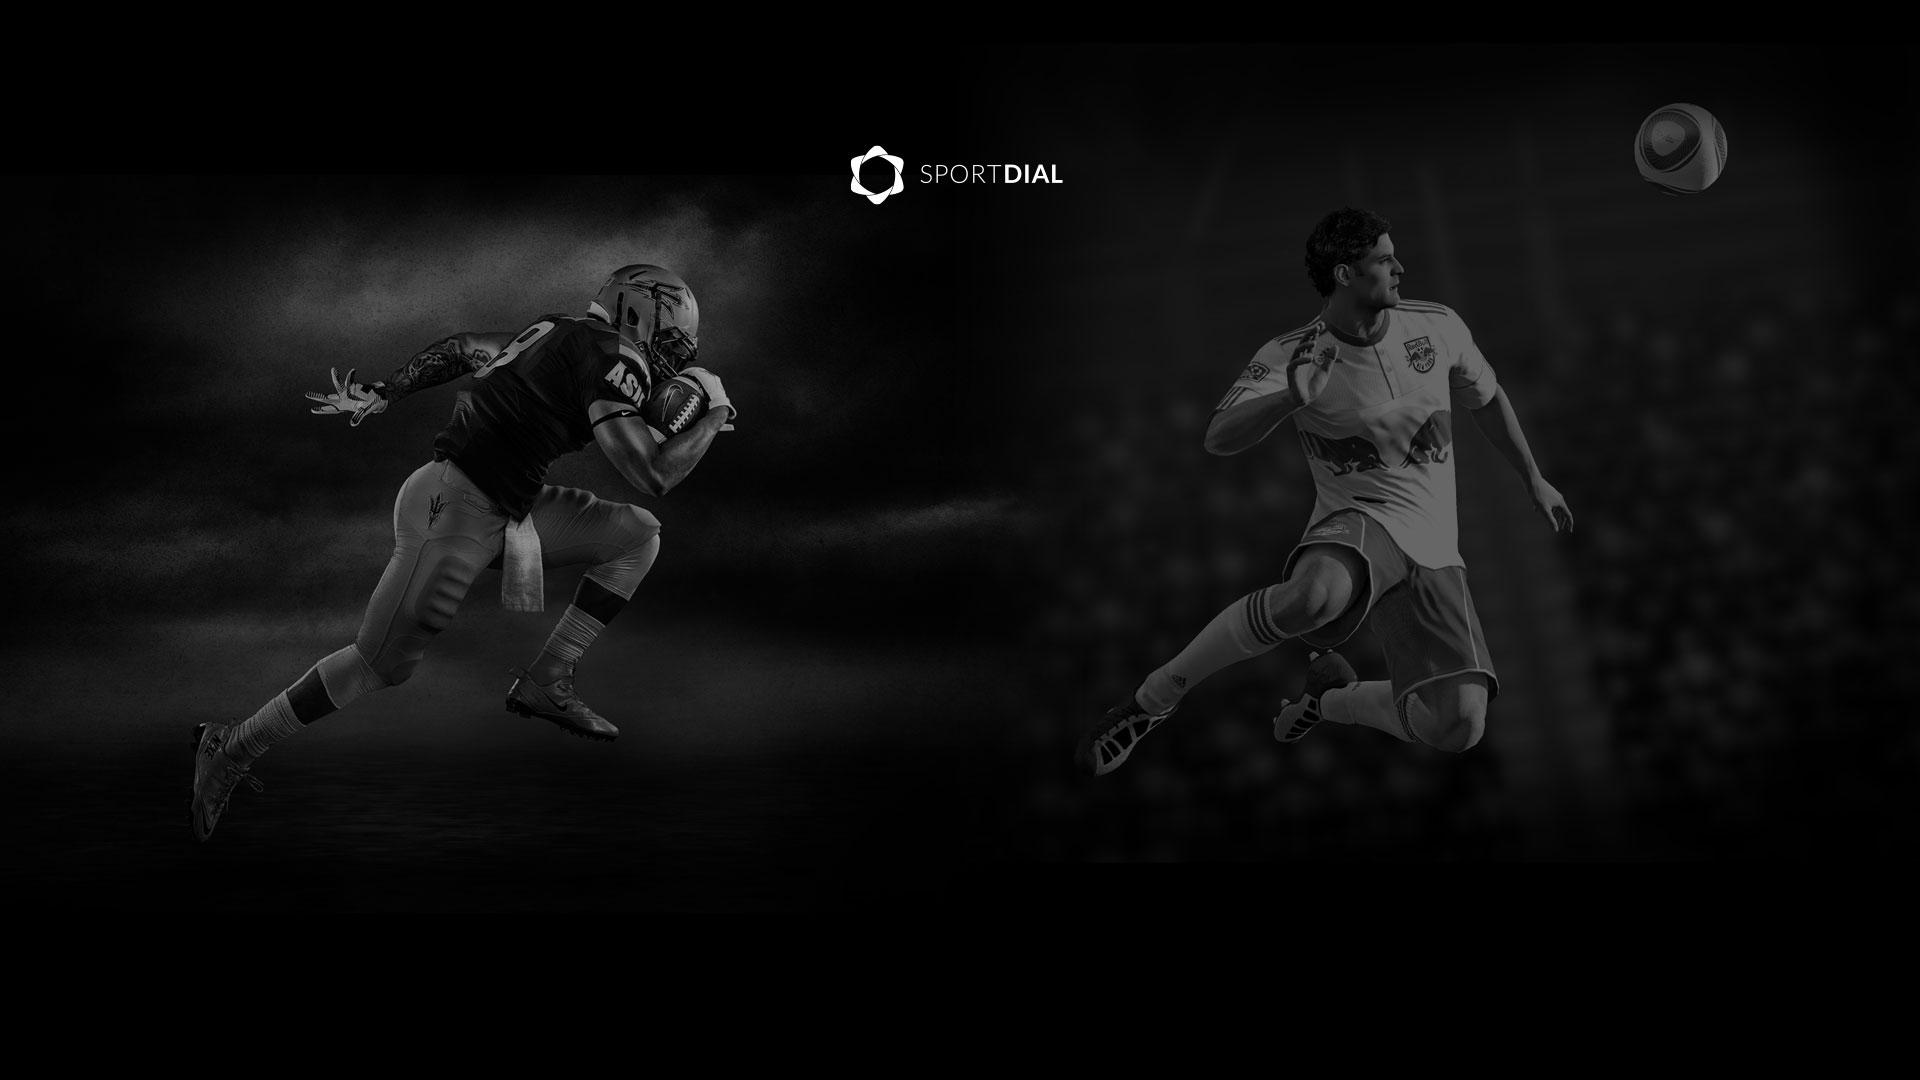 SportDial. Fútbol y Fútbol Americano